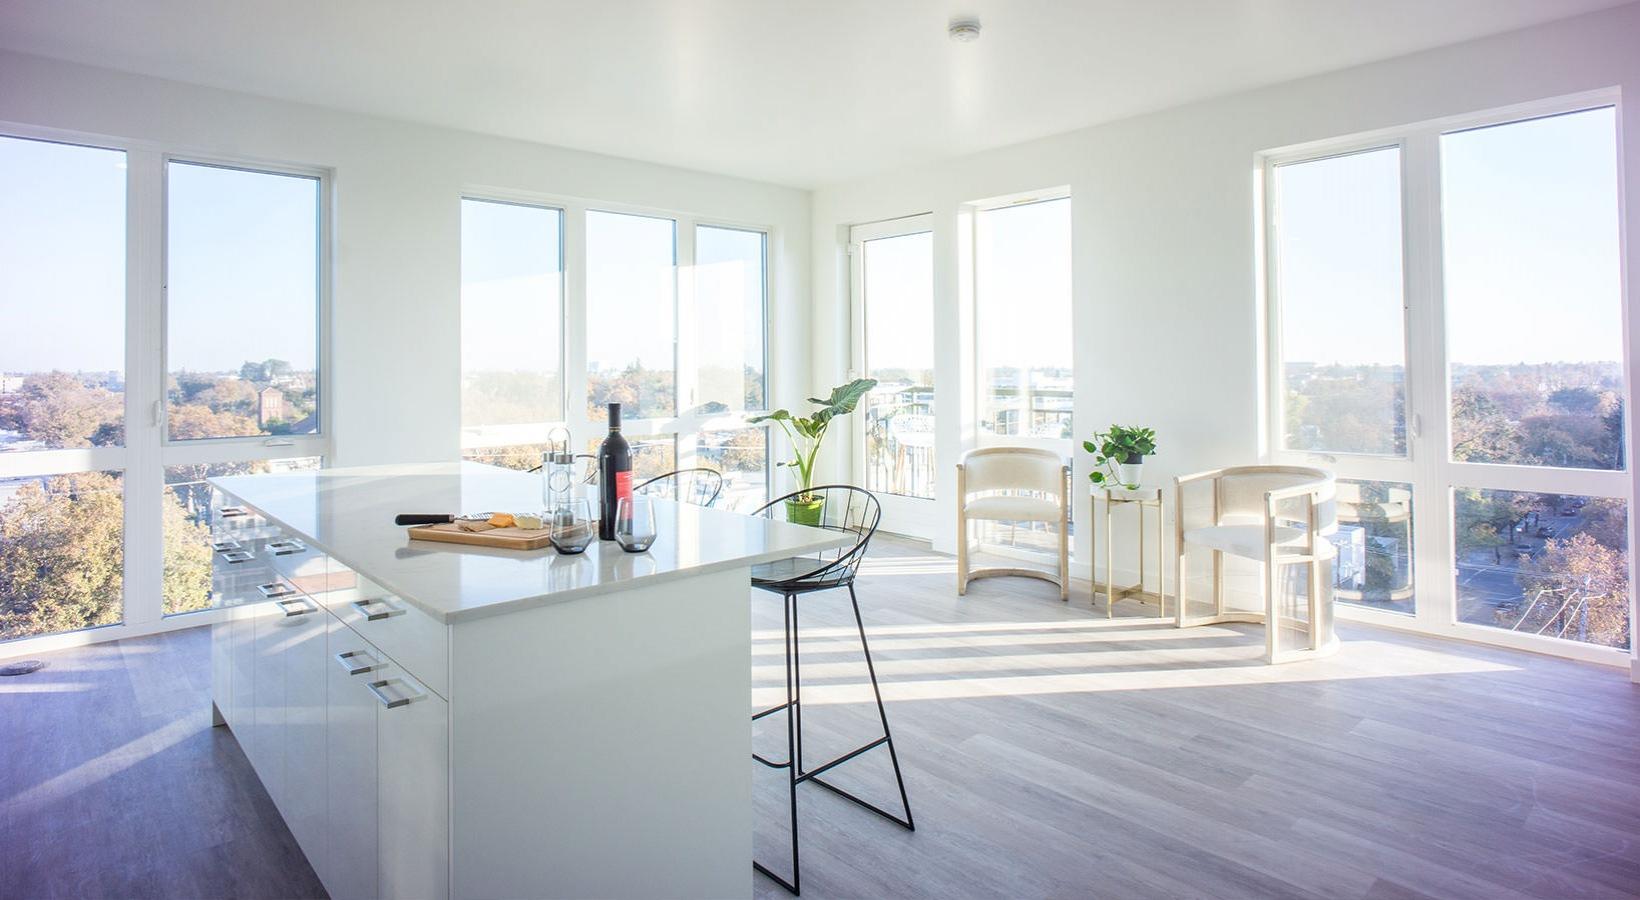 19J Furnished Rentals -Sample Image of Sacramento, CA Construction Crew Housing